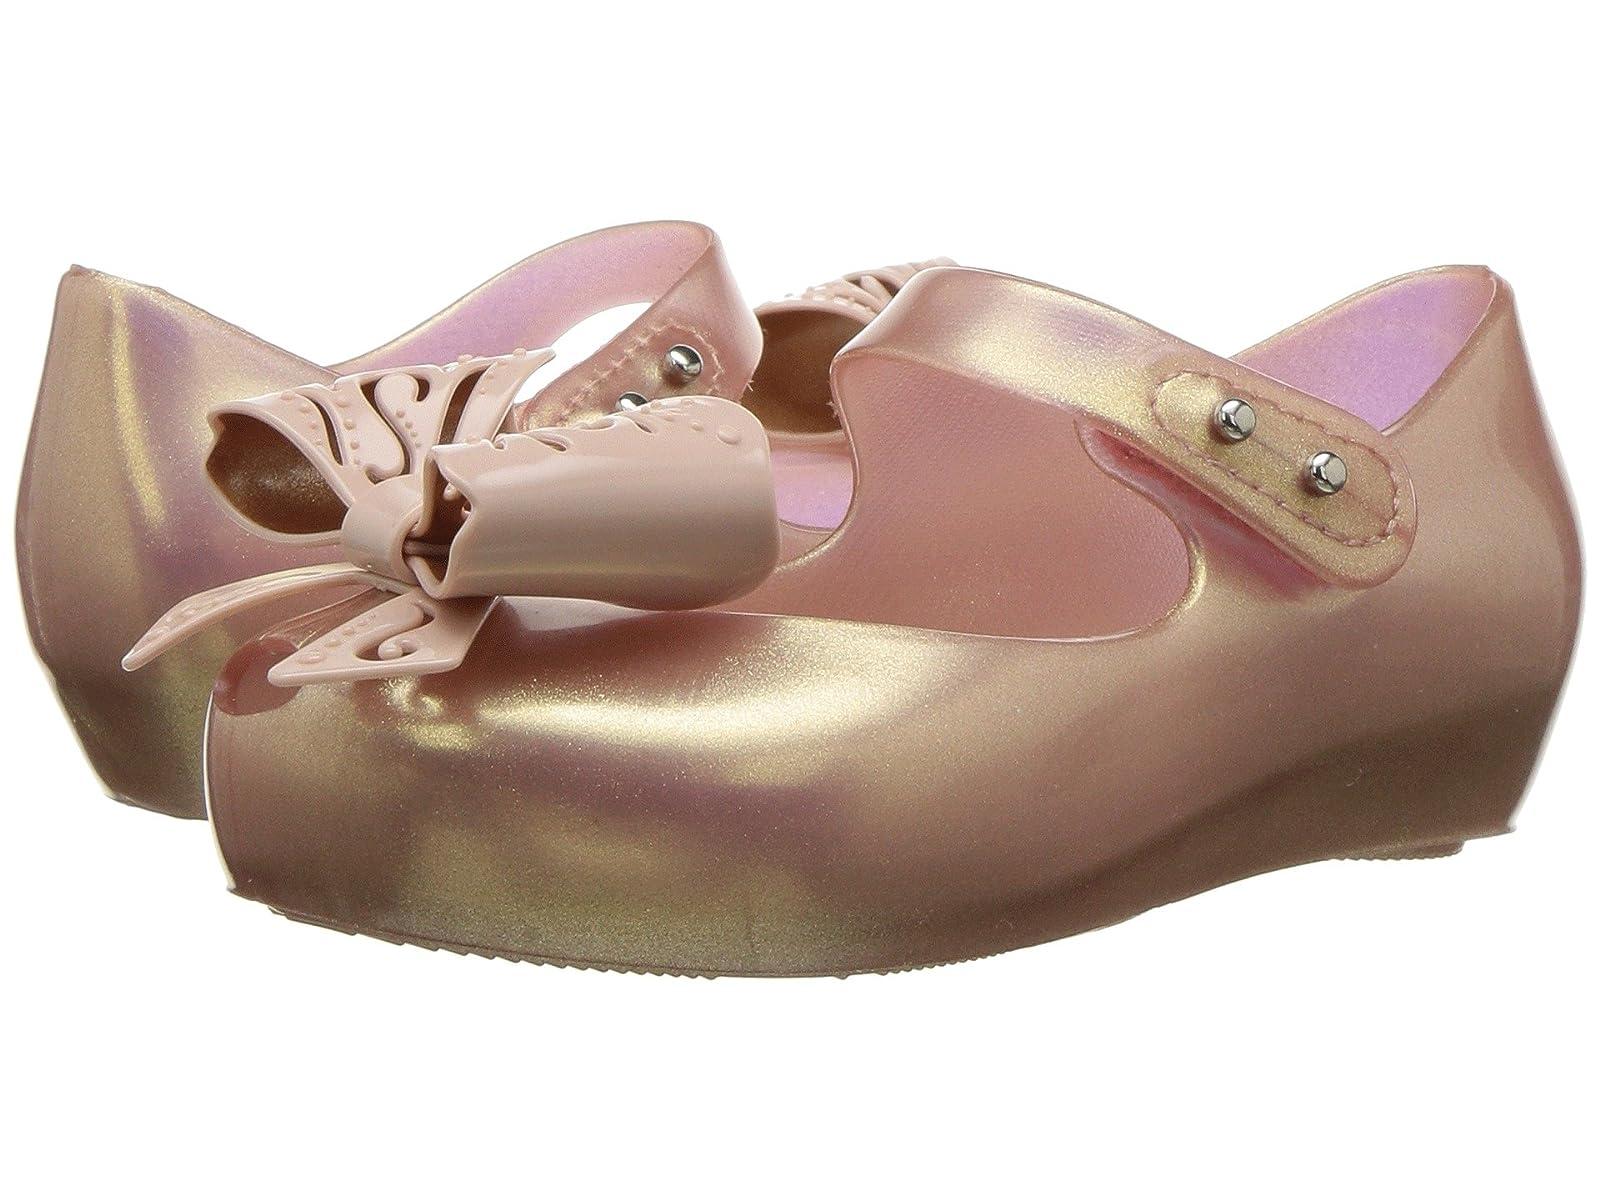 Mini Melissa Mini Ultragirl IX (Toddler/Little Kid)Atmospheric grades have affordable shoes